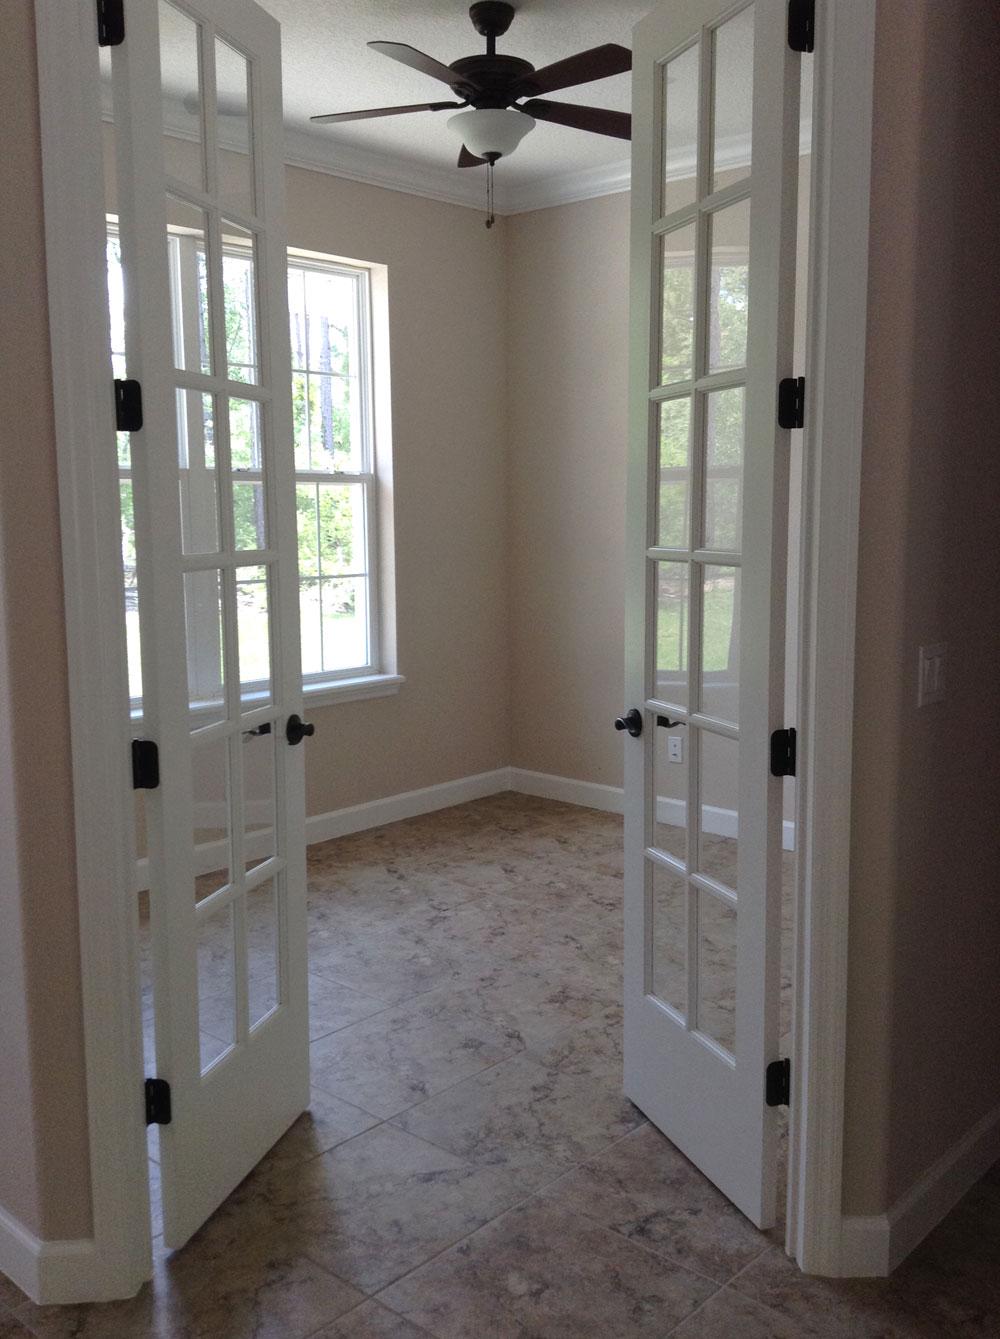 Floor Plans - Antigua & Antigua model - 3 Bedroom 2 Bath ...